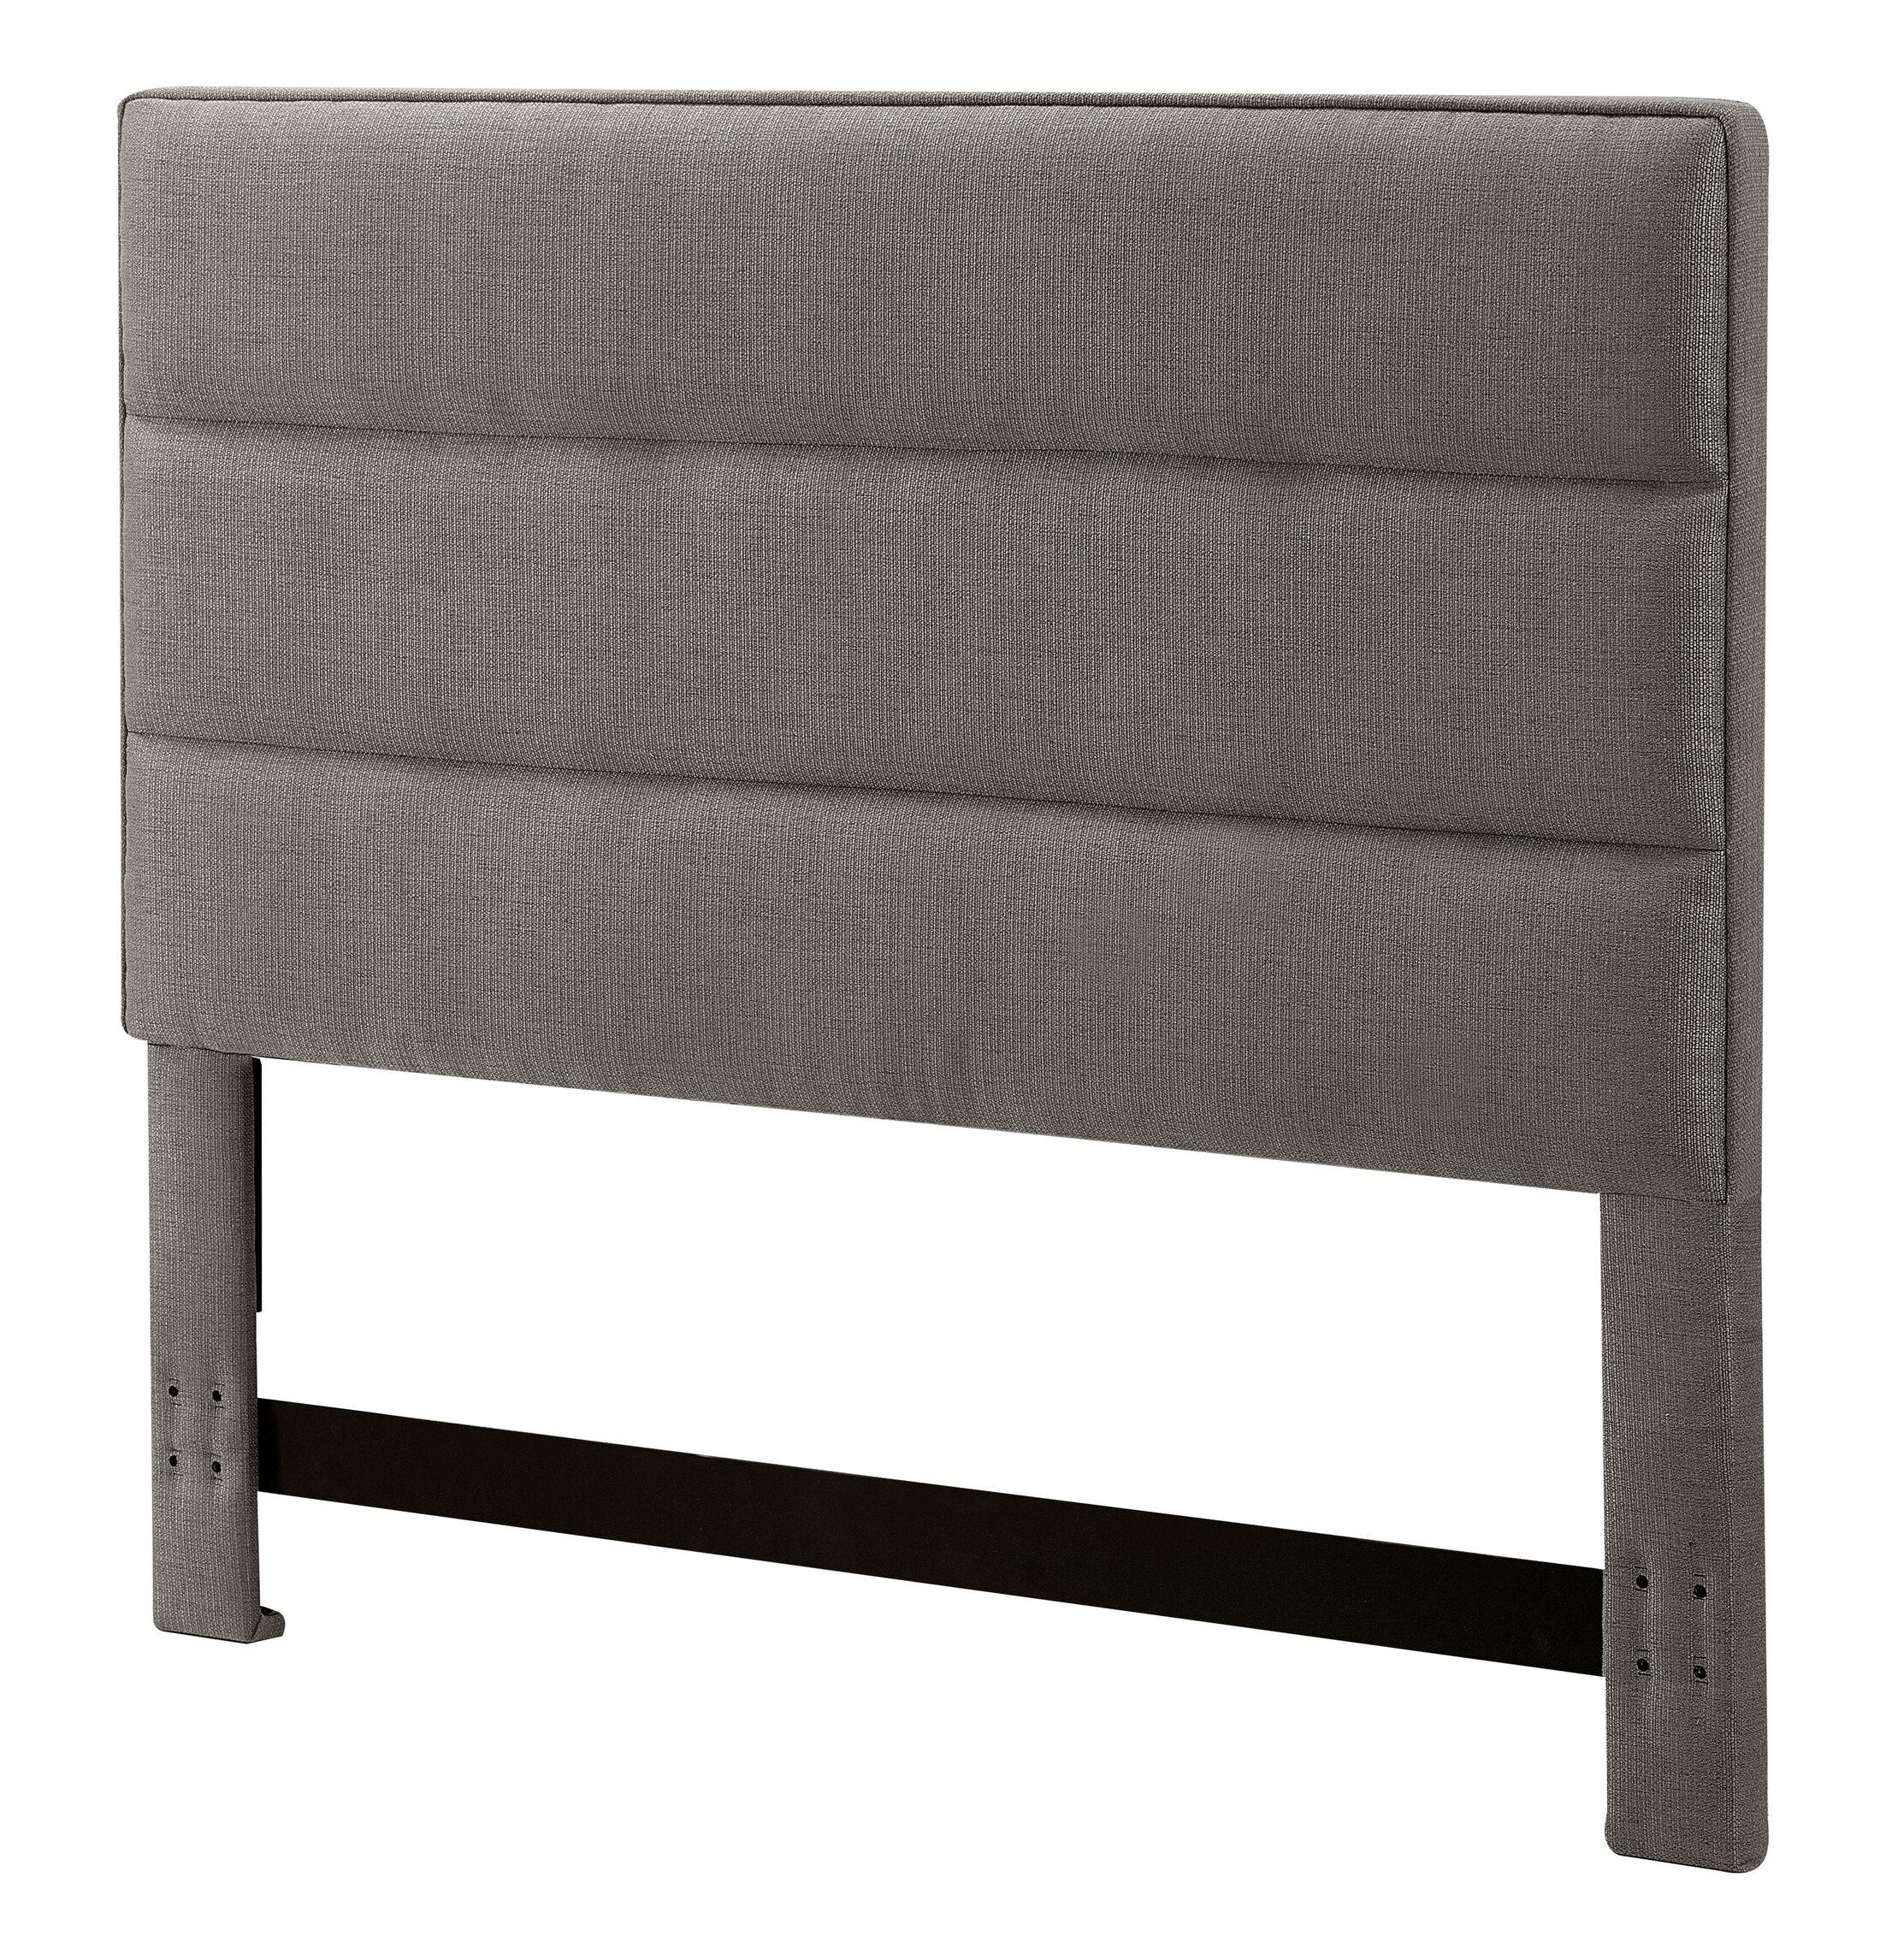 Upholstered Panel Headboard Size: King, Upholstery: Neutral Gray